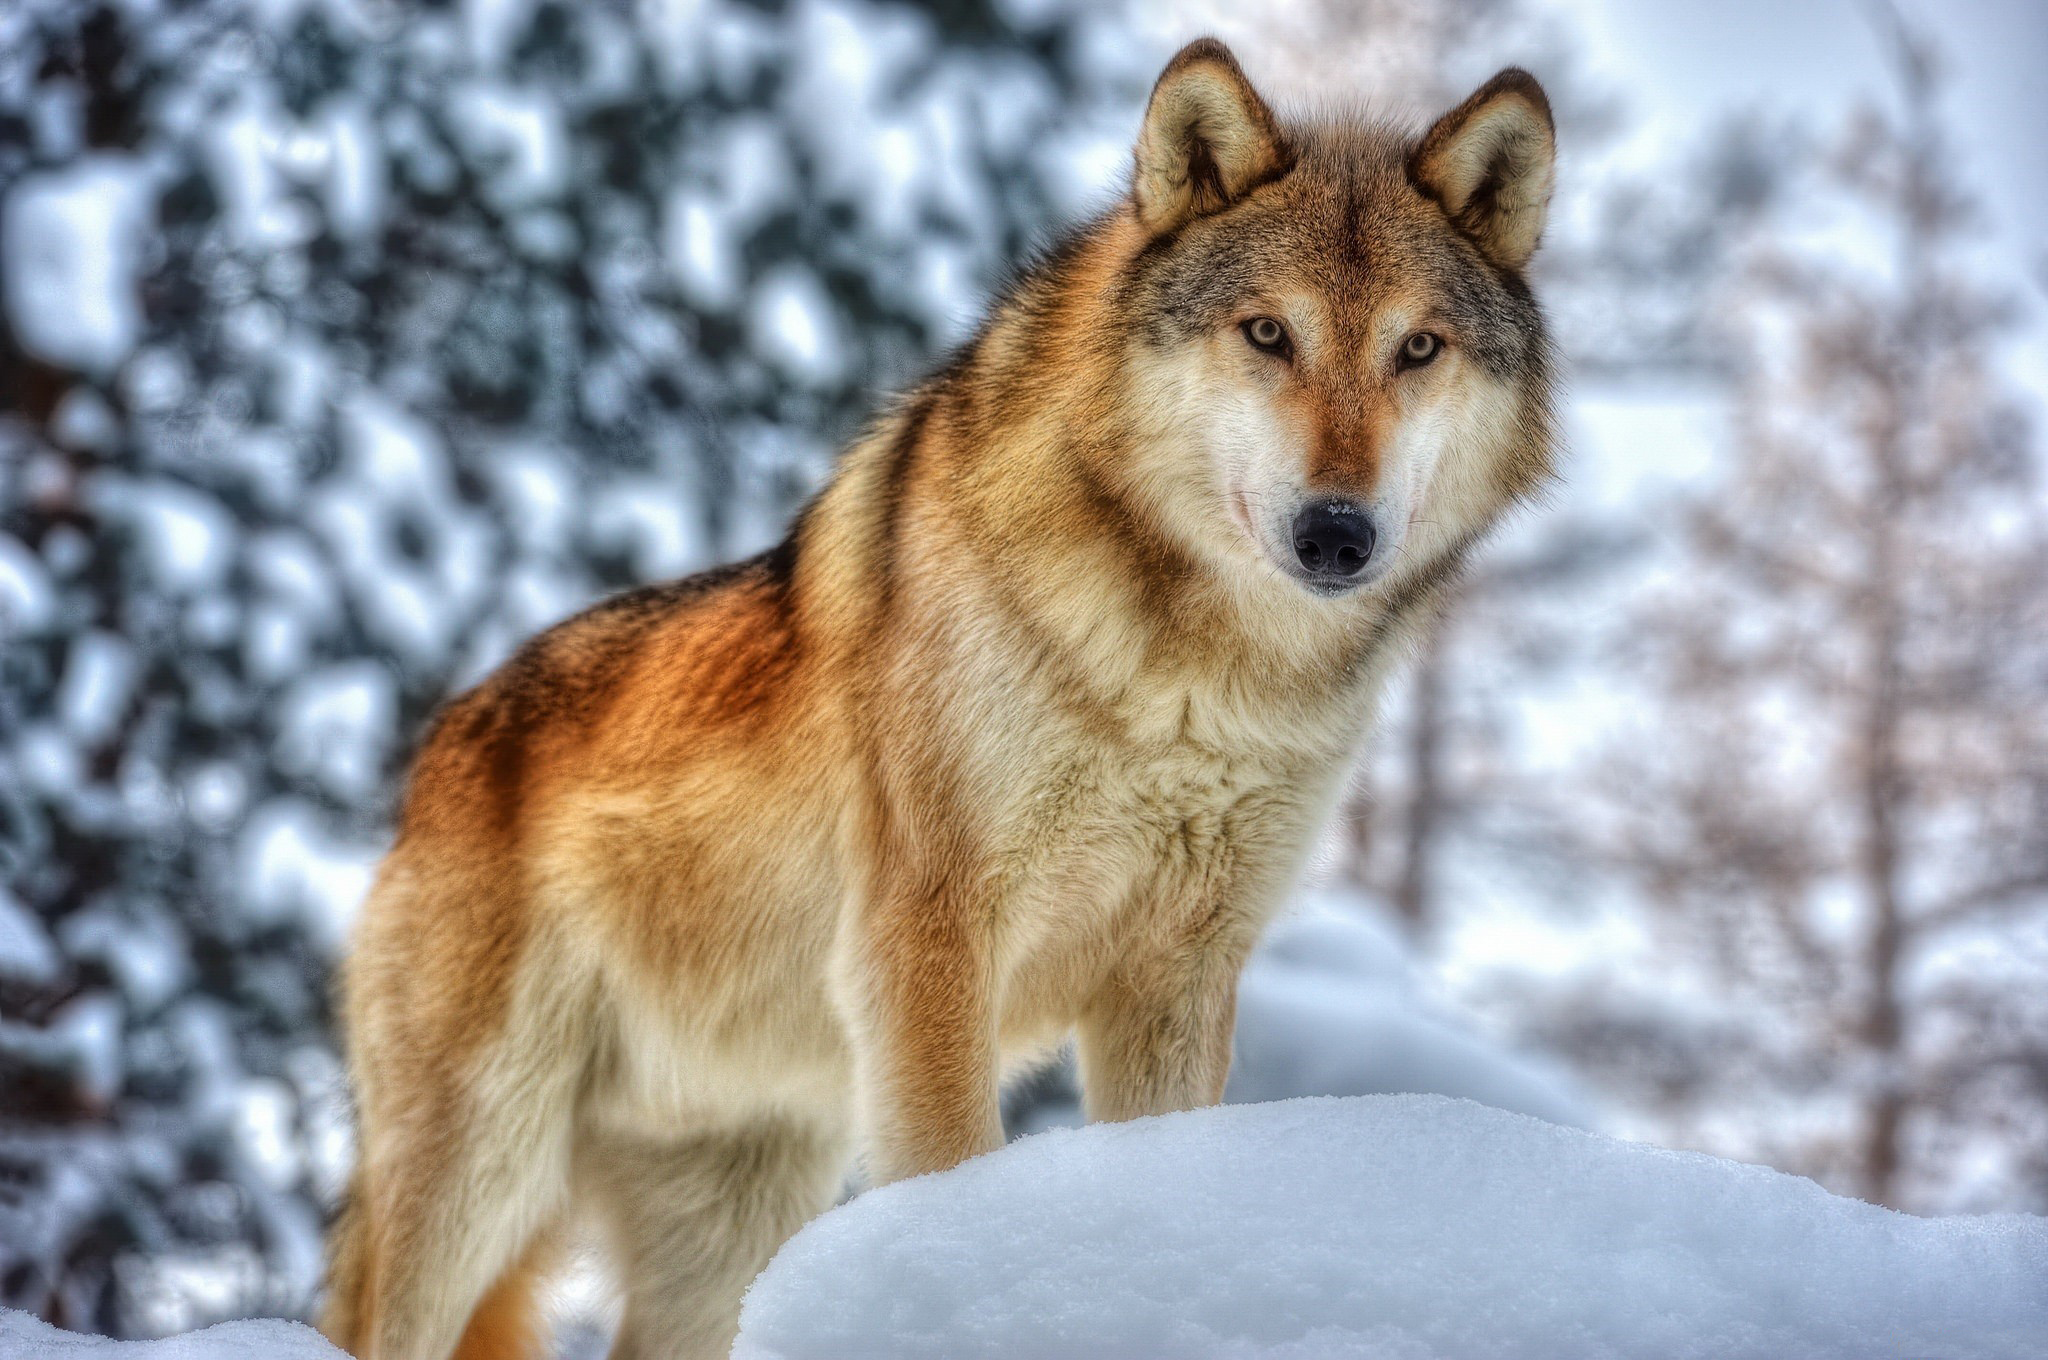 Картинка про волков на снегу